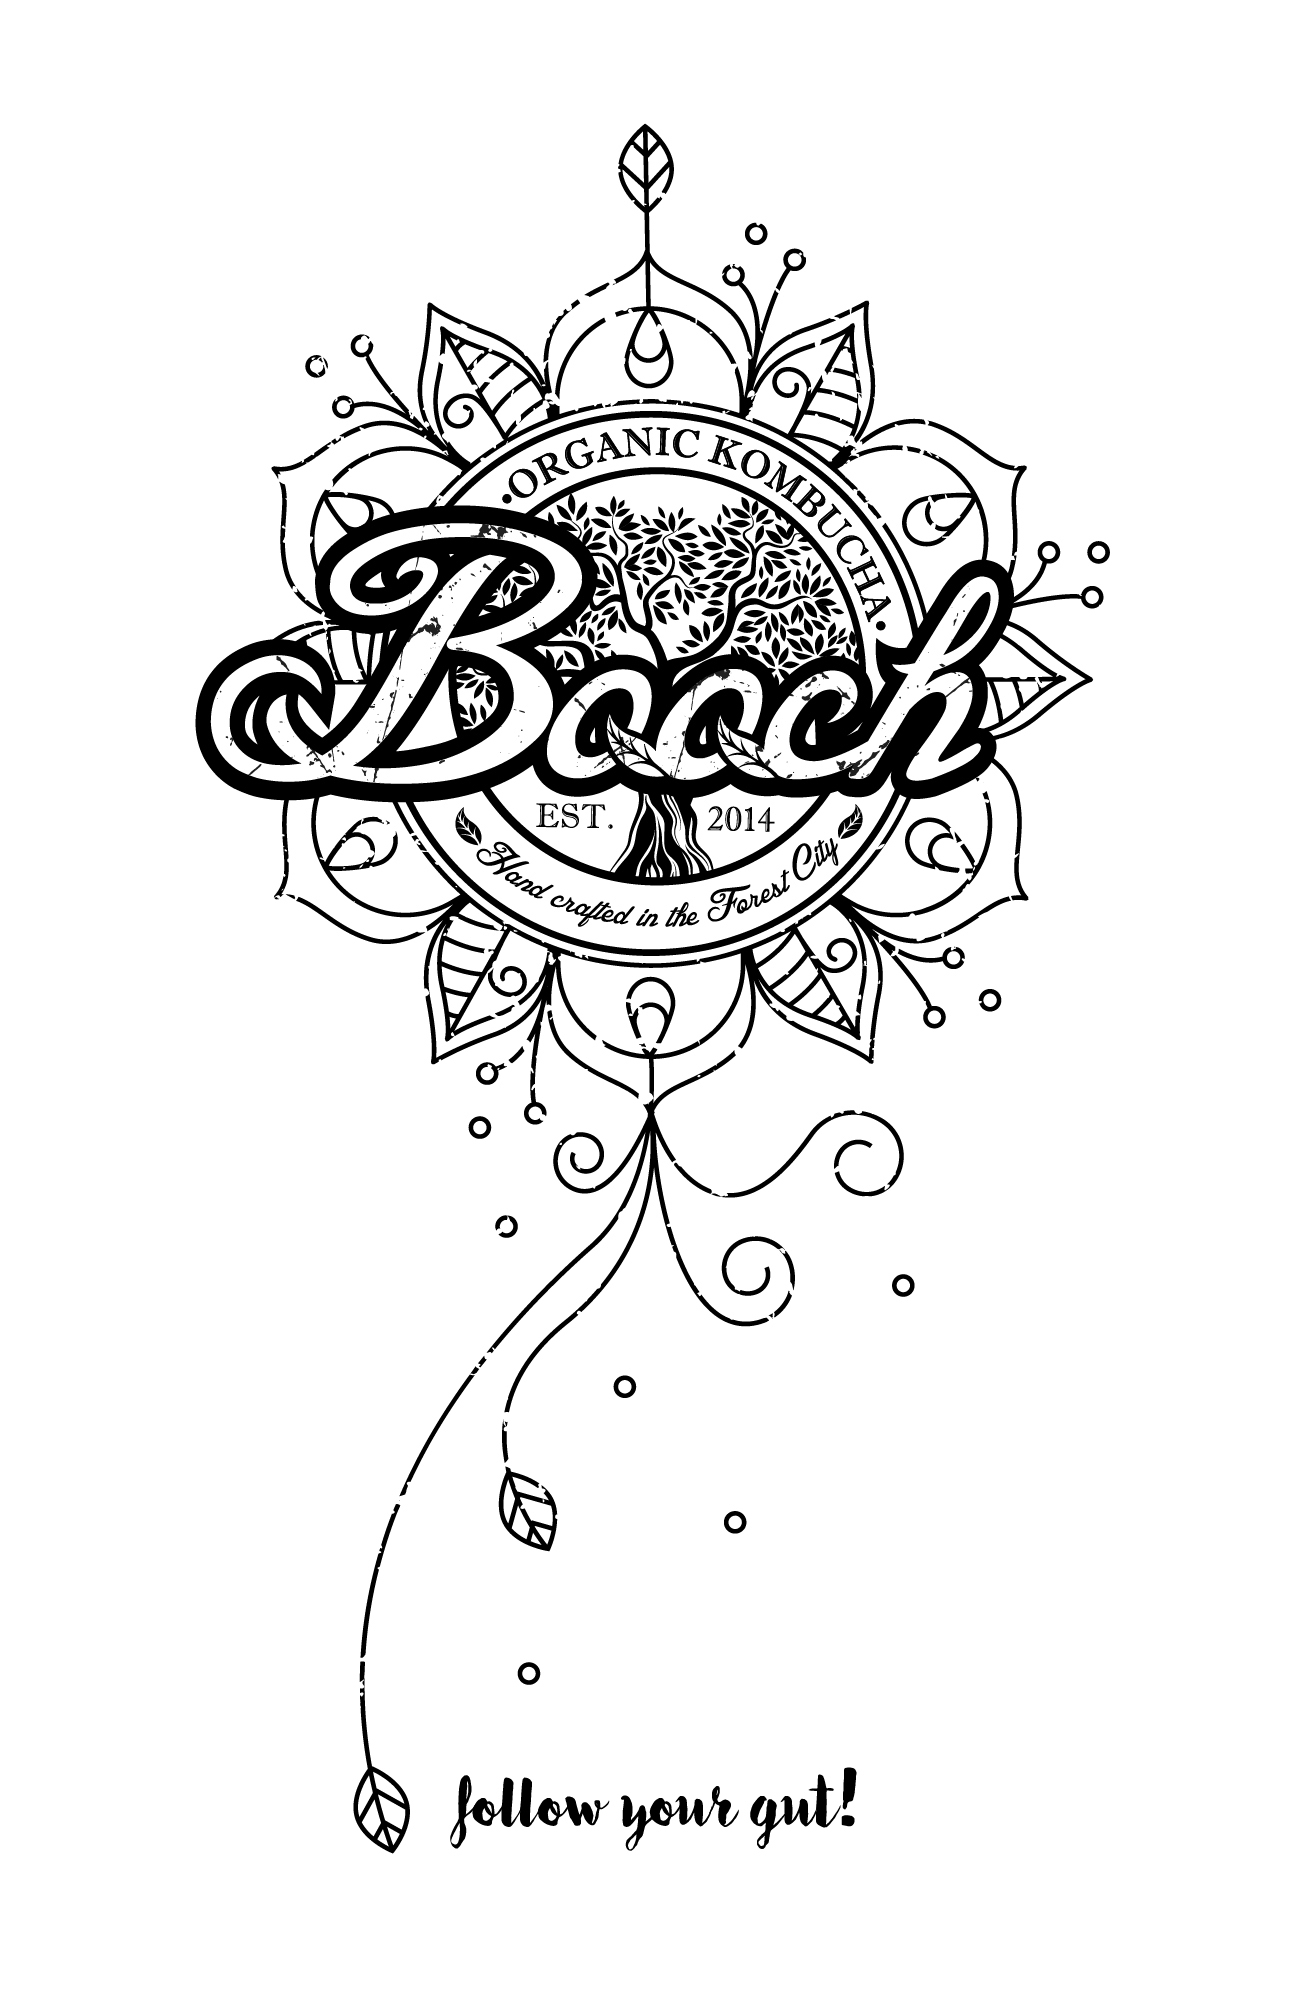 Booch Mandala Glass FINAL-01.jpg